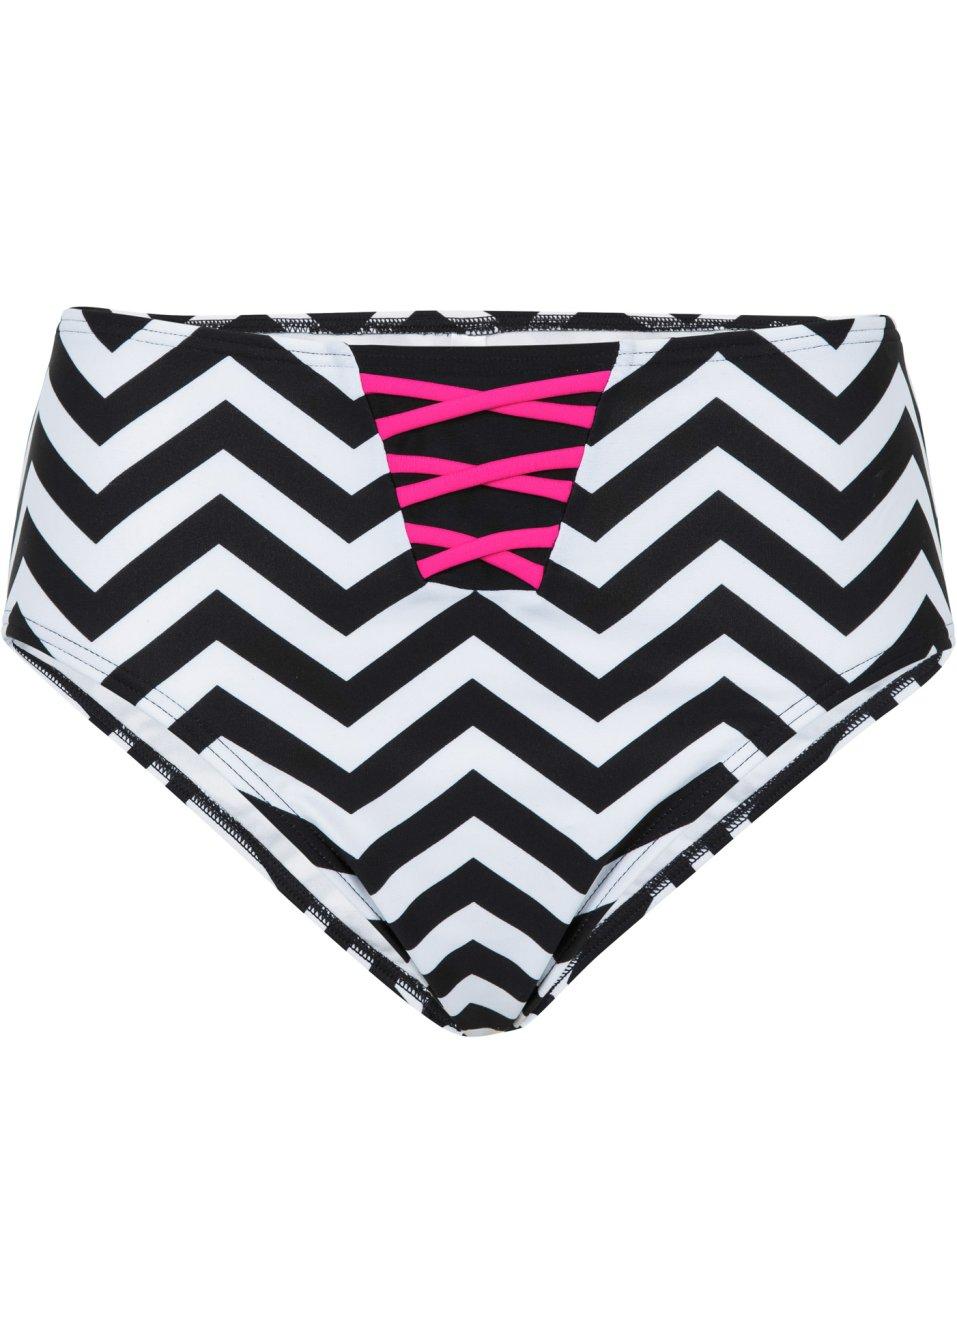 stylishe bikinihose in high waist form schwarz wei. Black Bedroom Furniture Sets. Home Design Ideas